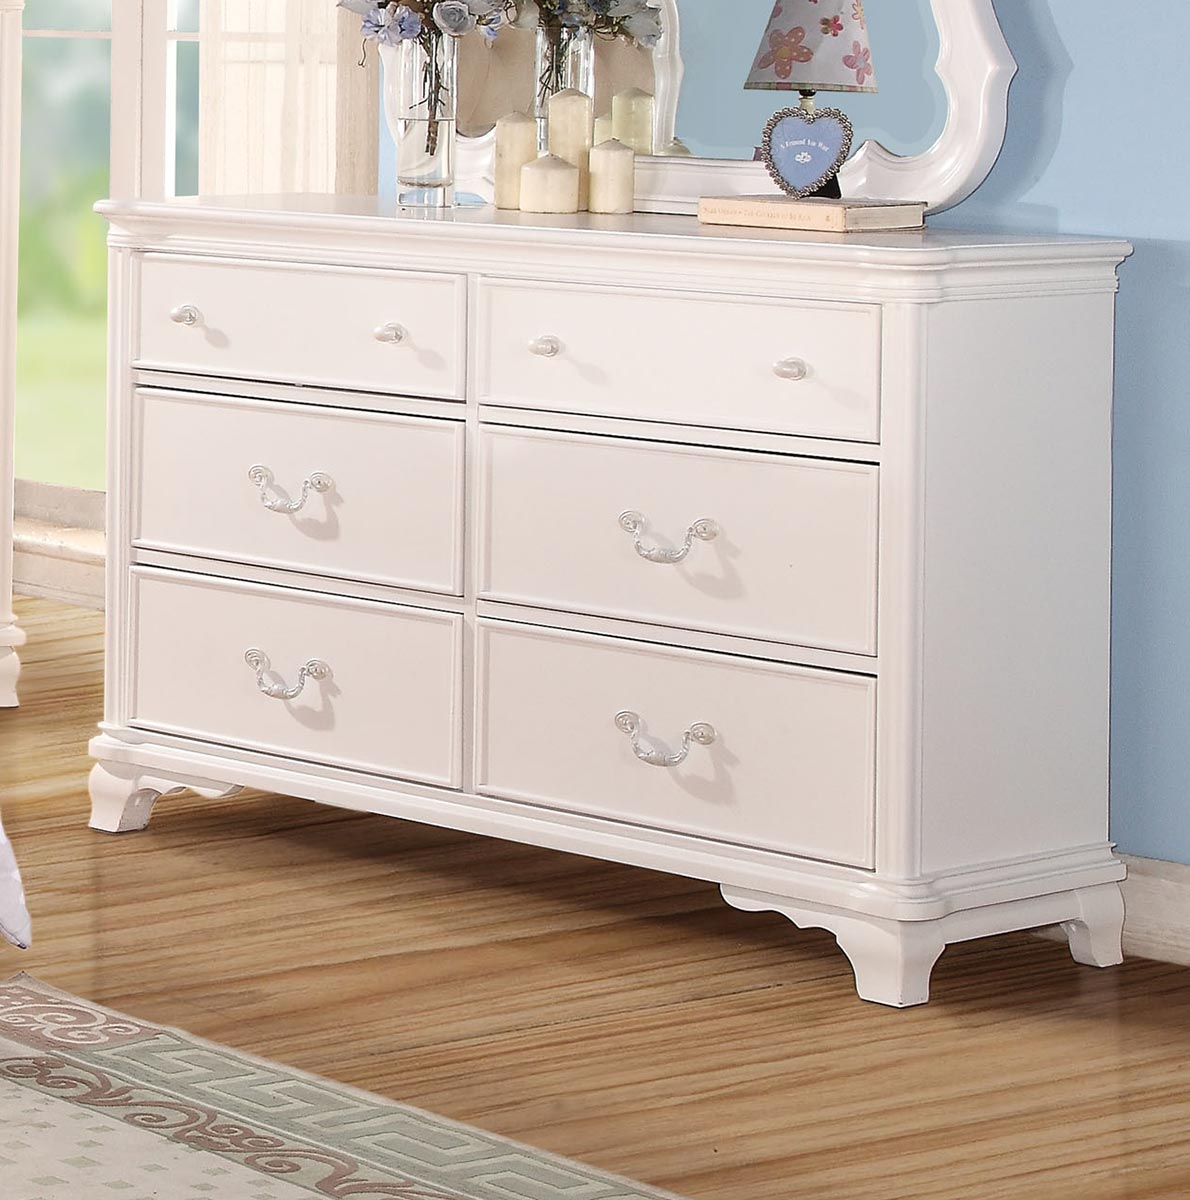 Acme Ira Dresser - White